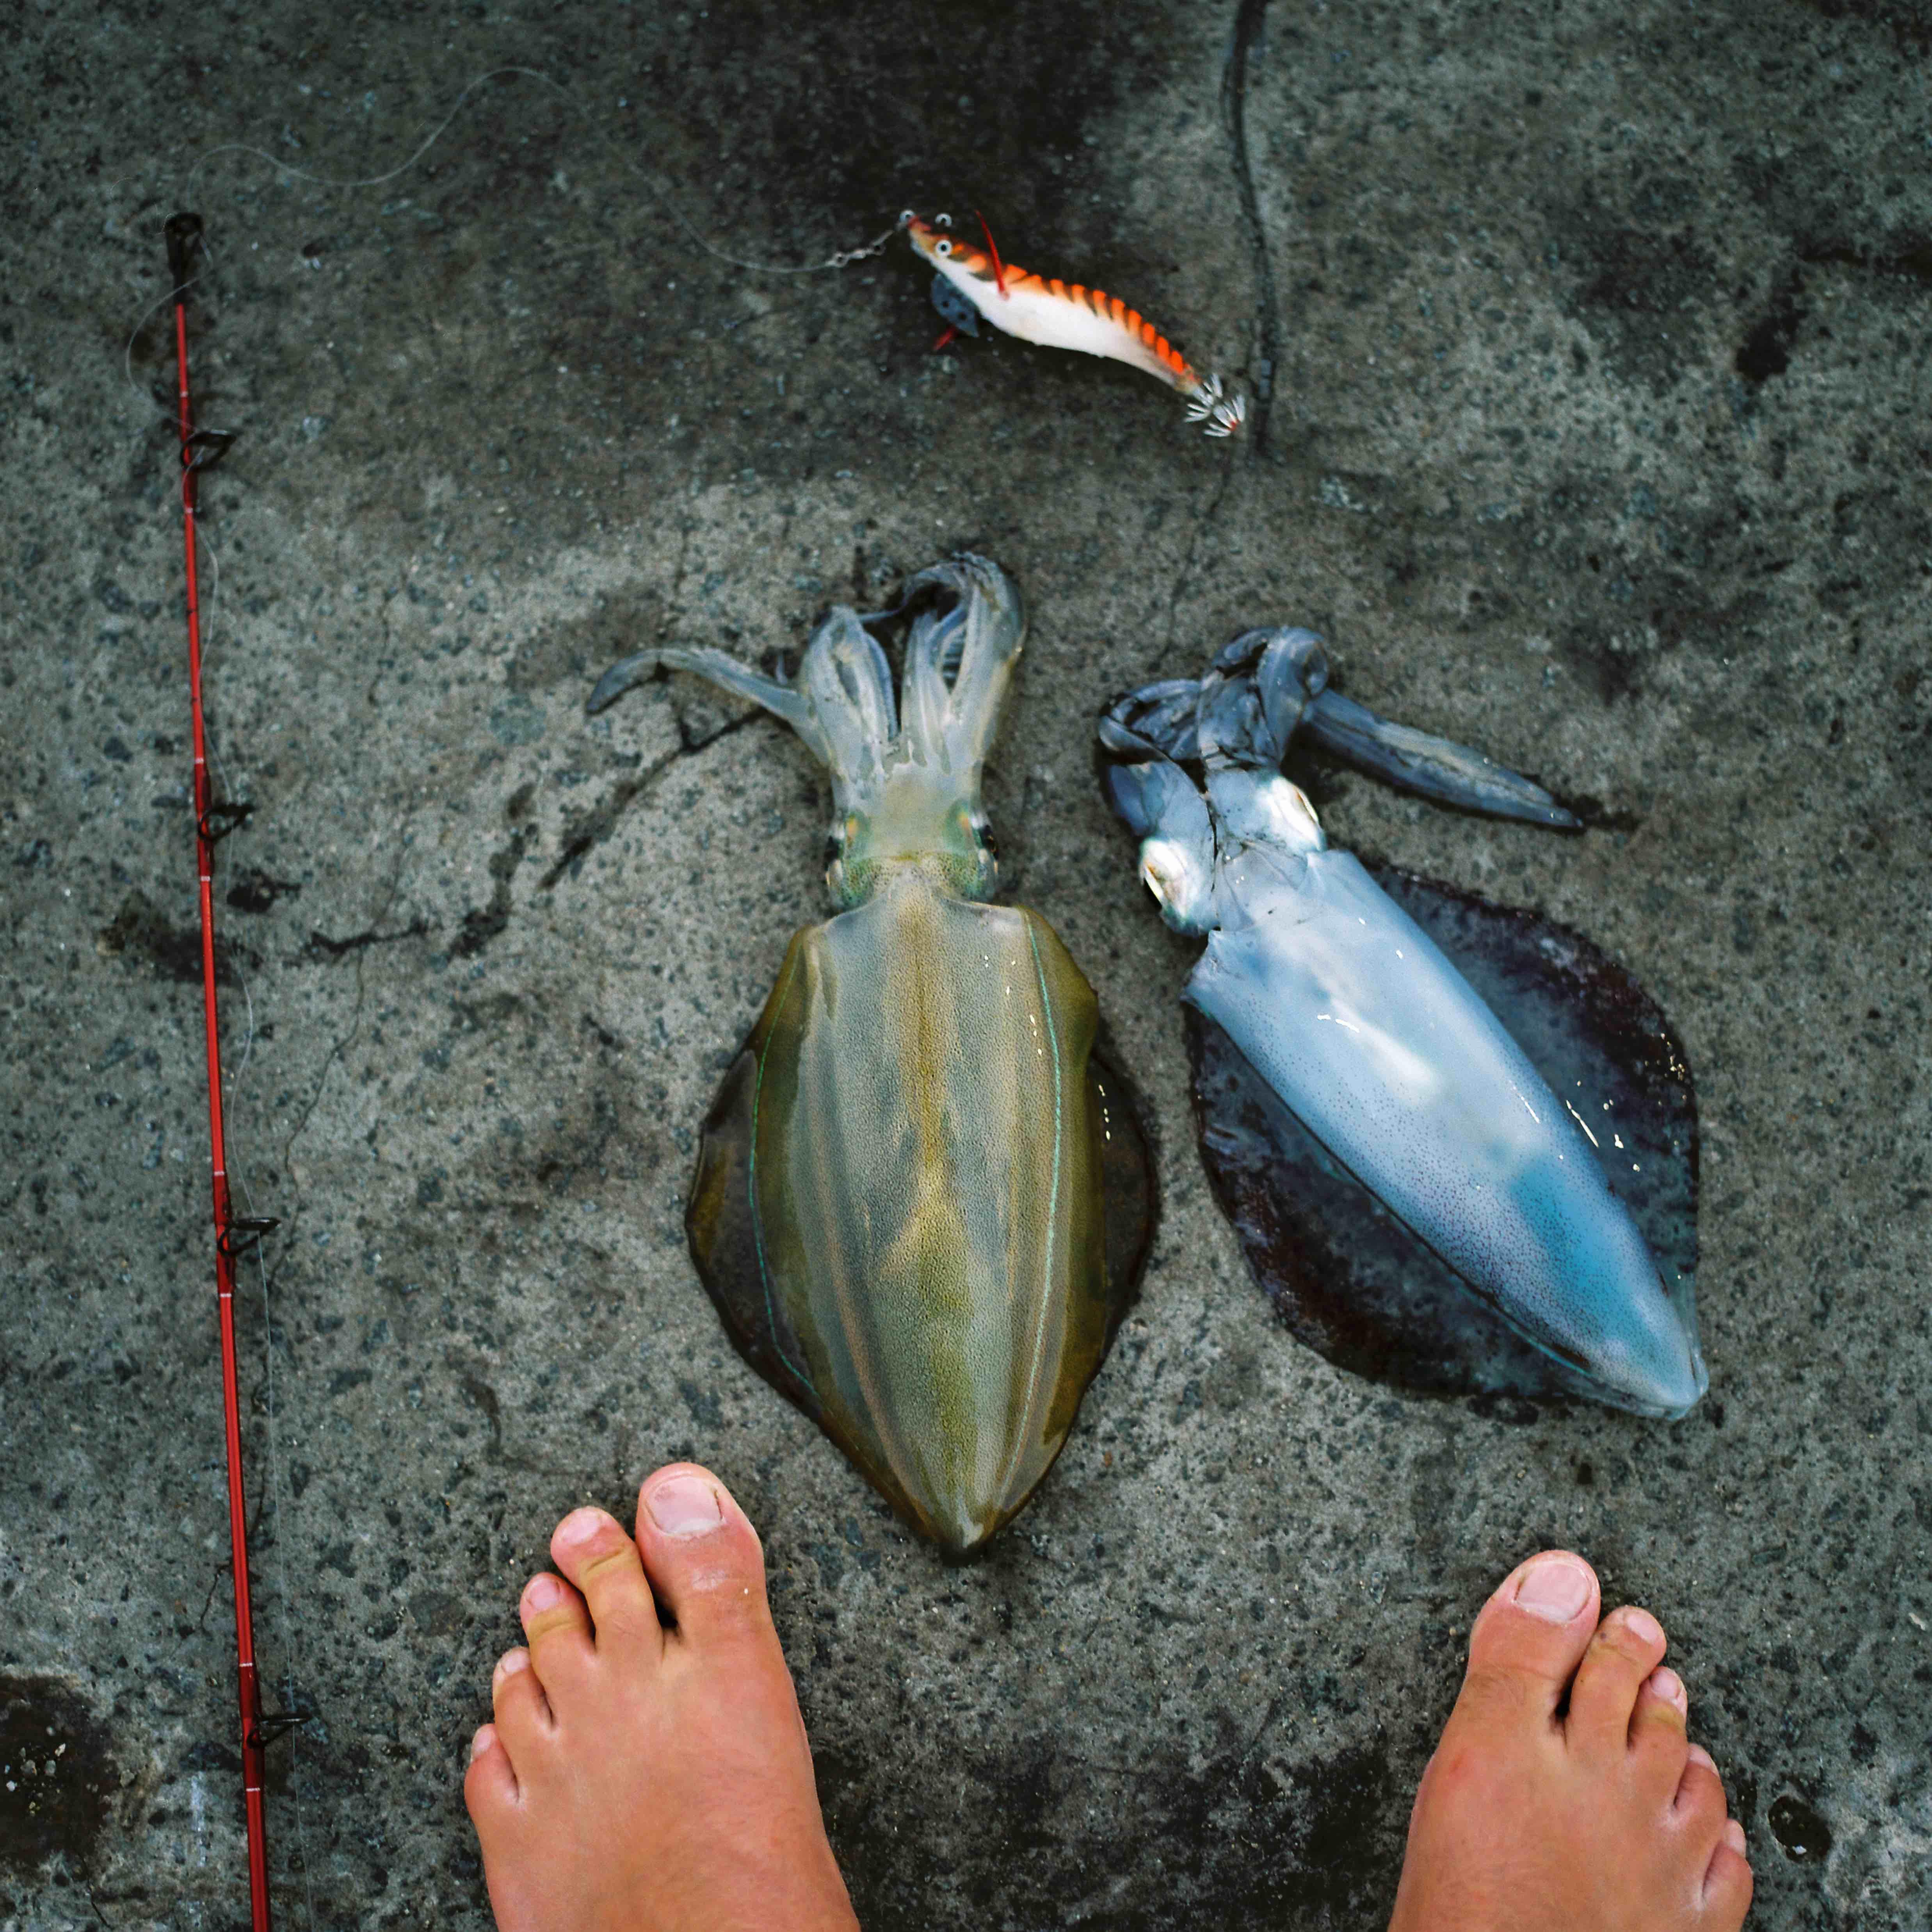 Calamari-Tas_JBowden_Huck_HD